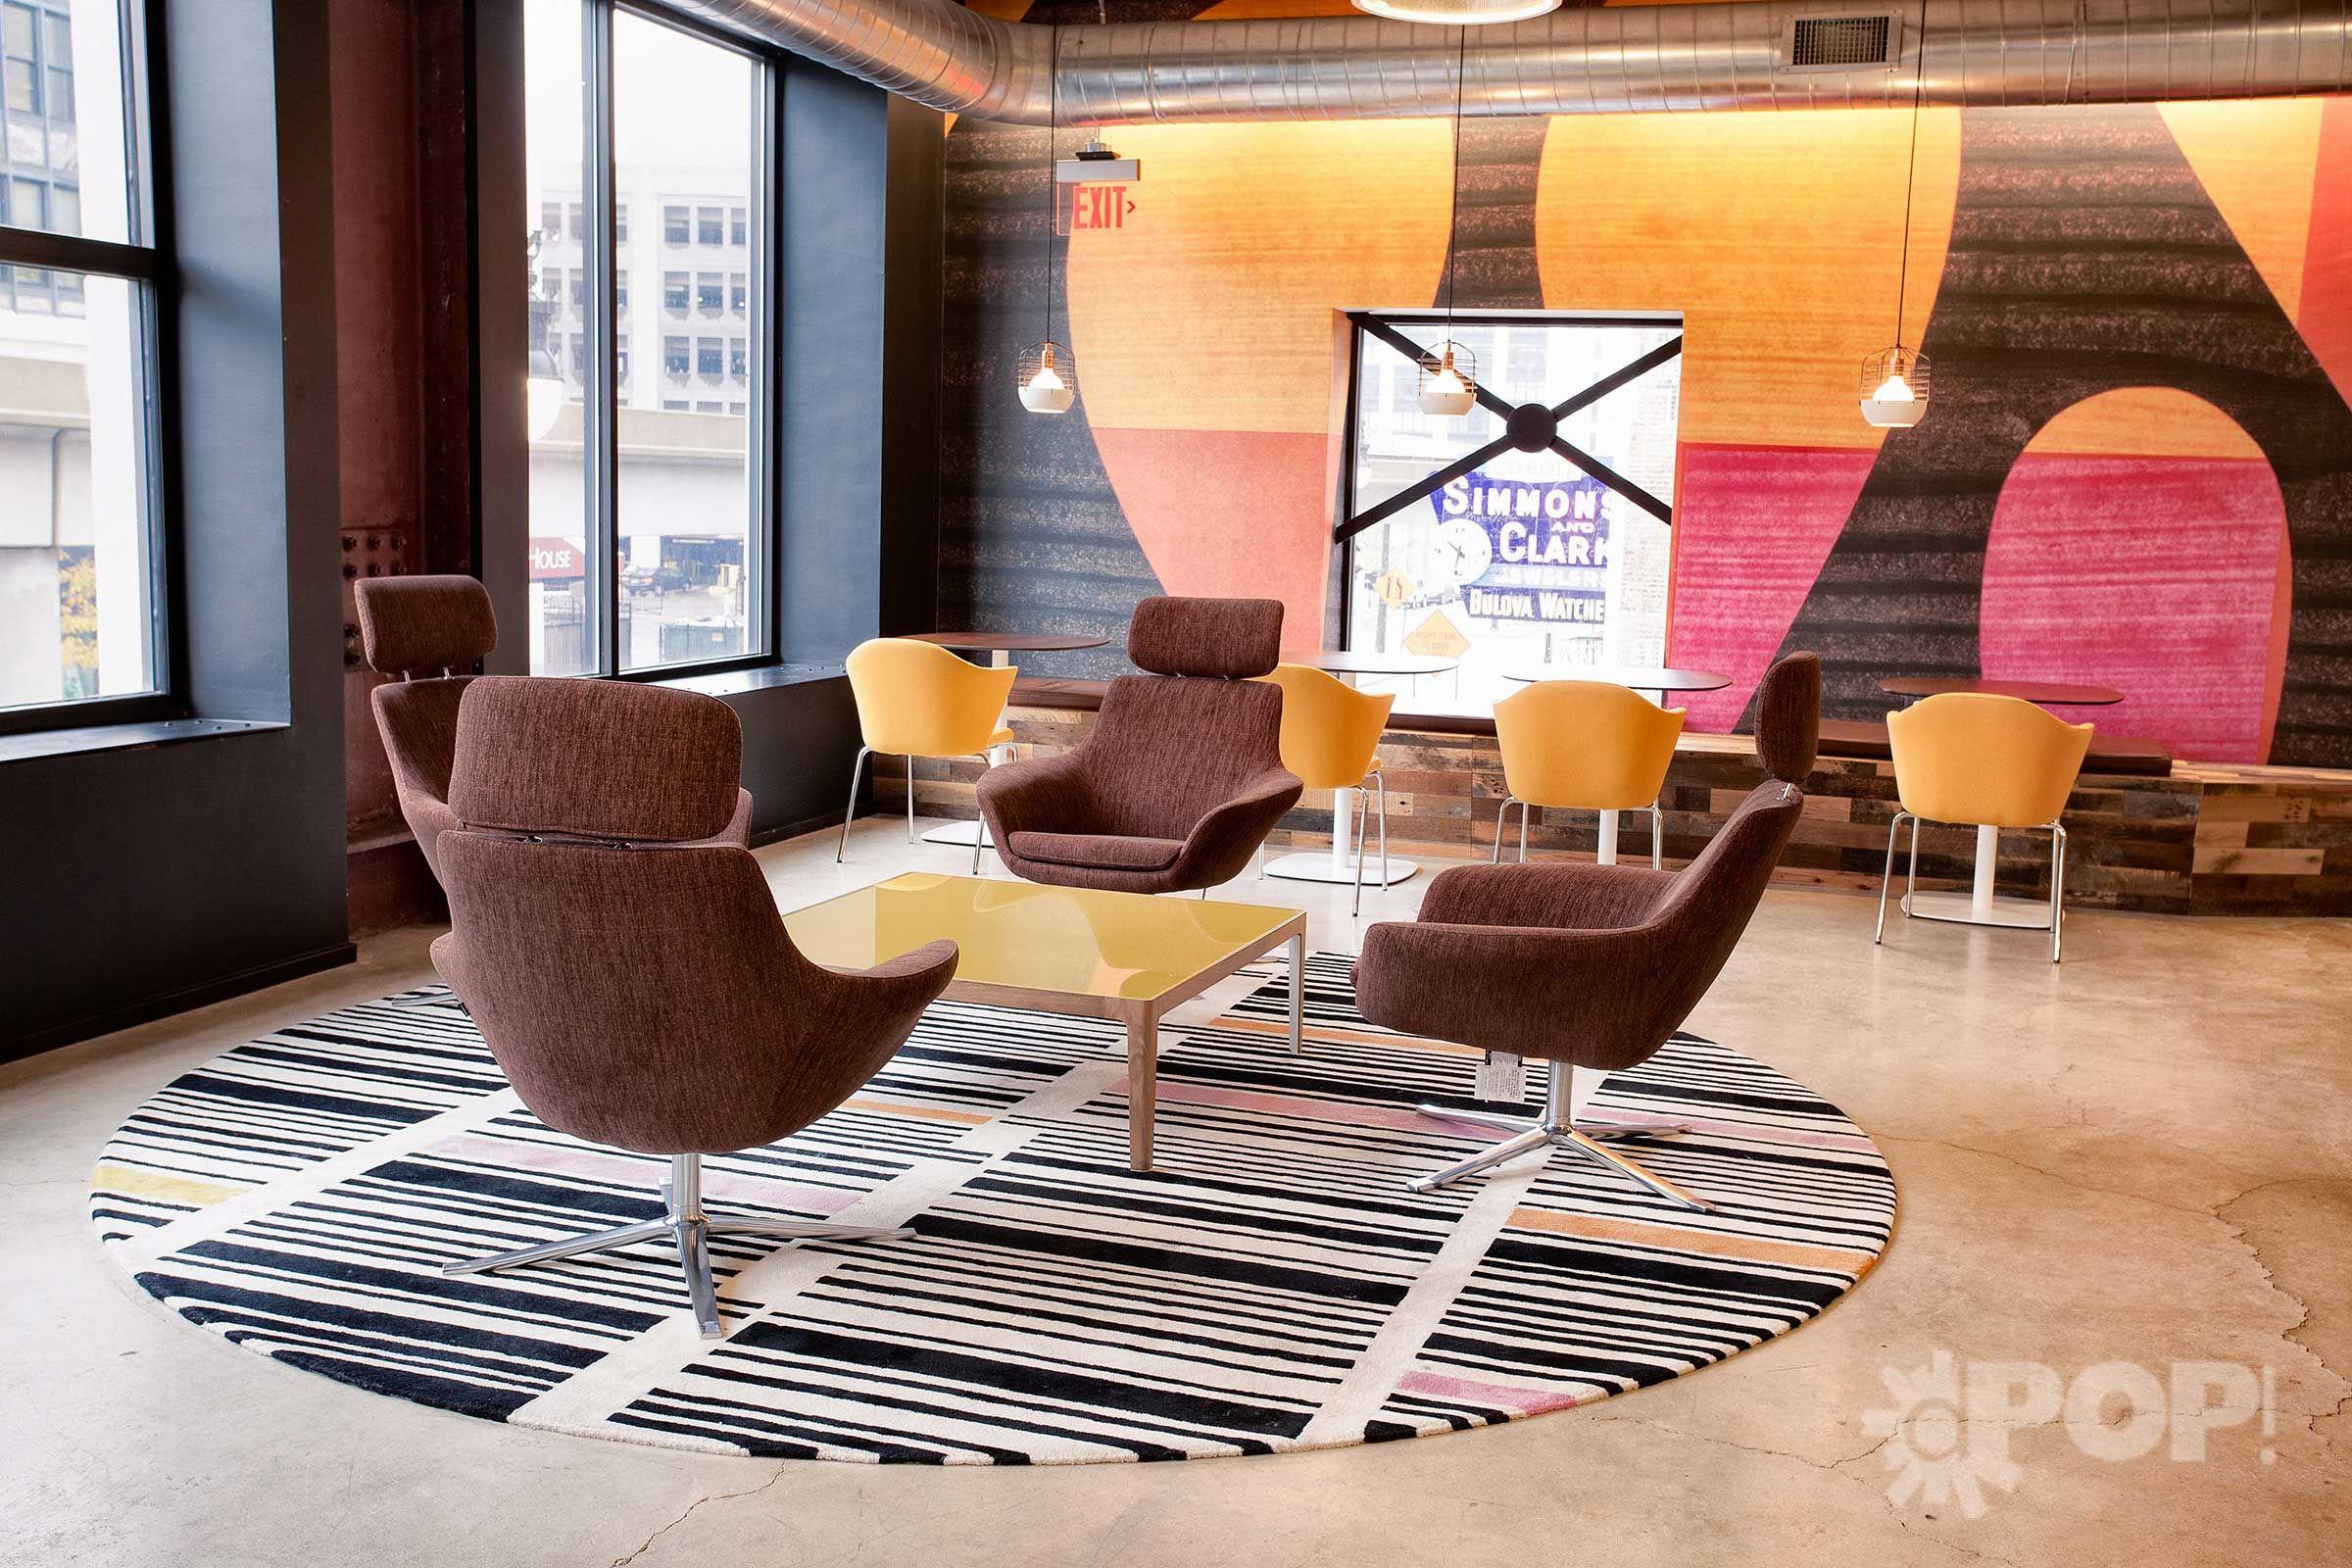 Coalesse Bob lounge CG1 Capa Guest Chair and Enea Lottus Cafe